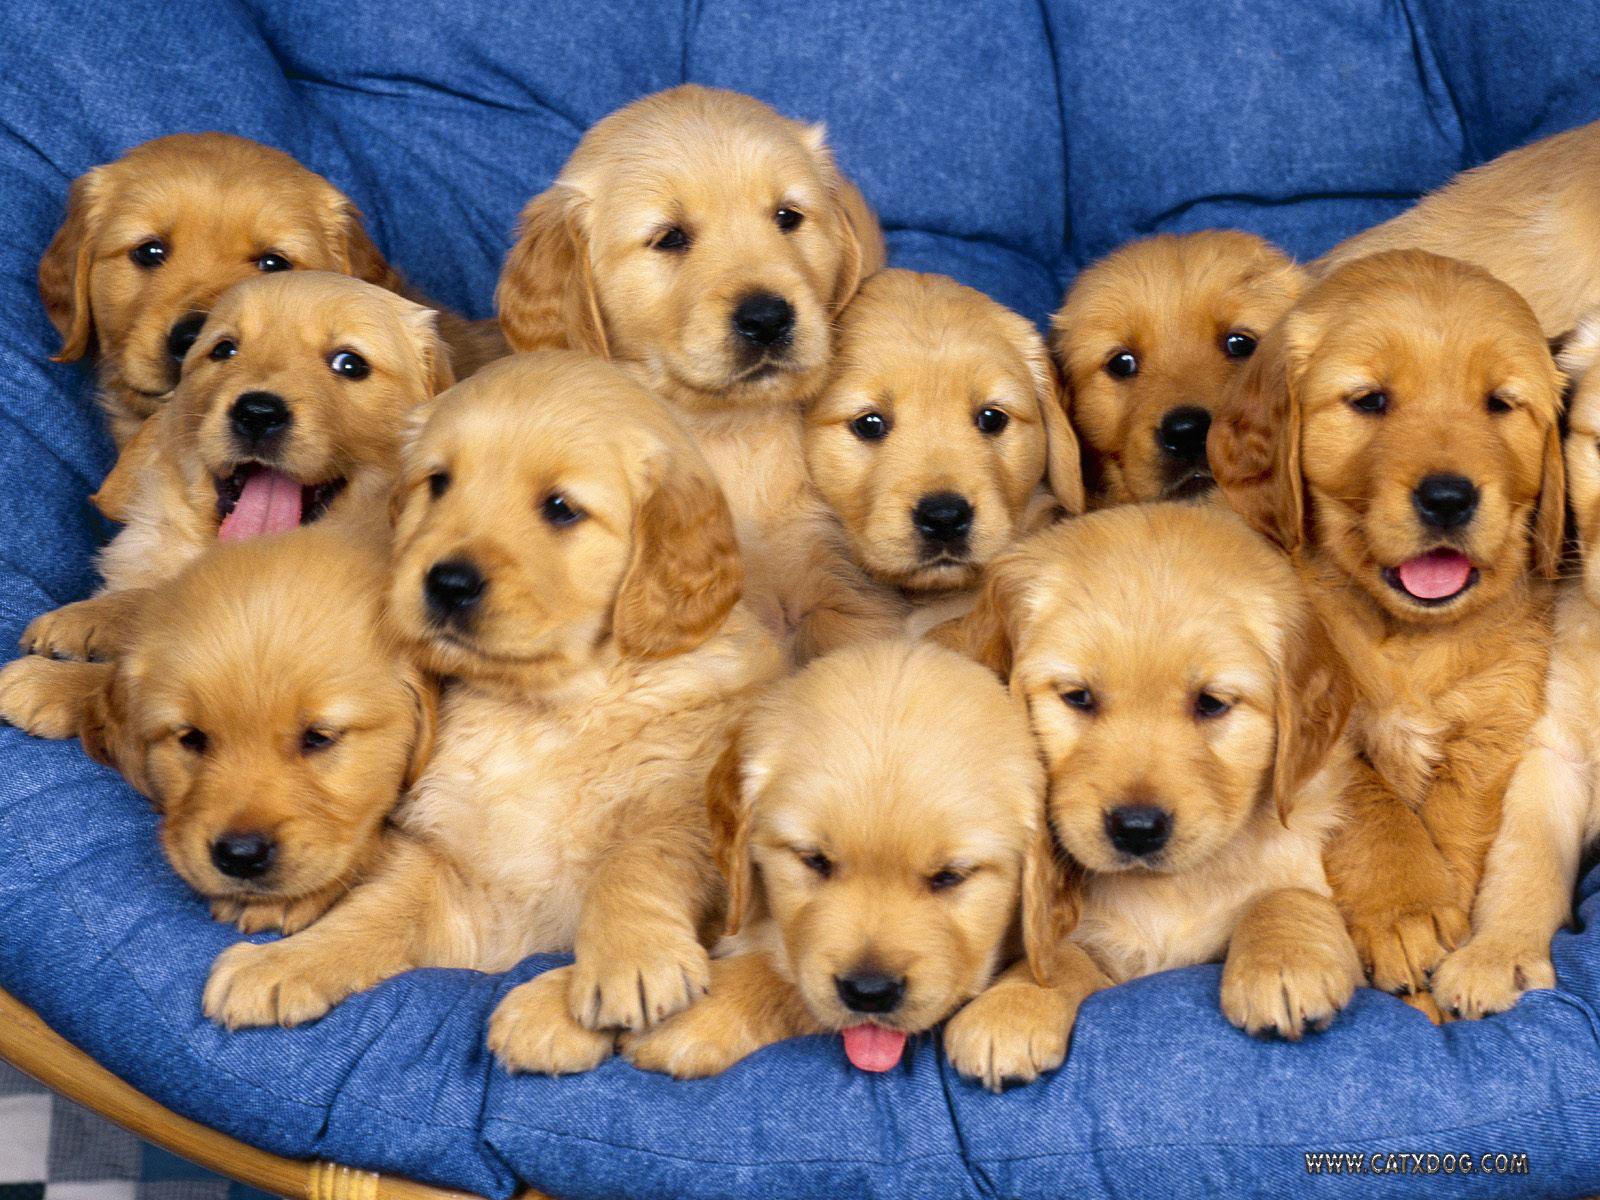 http://3.bp.blogspot.com/-IZ02nZDGoMY/TYoL0fvN1qI/AAAAAAAABIo/zG2-yLE3b8I/s1600/golden-retriever-puppies1.jpg